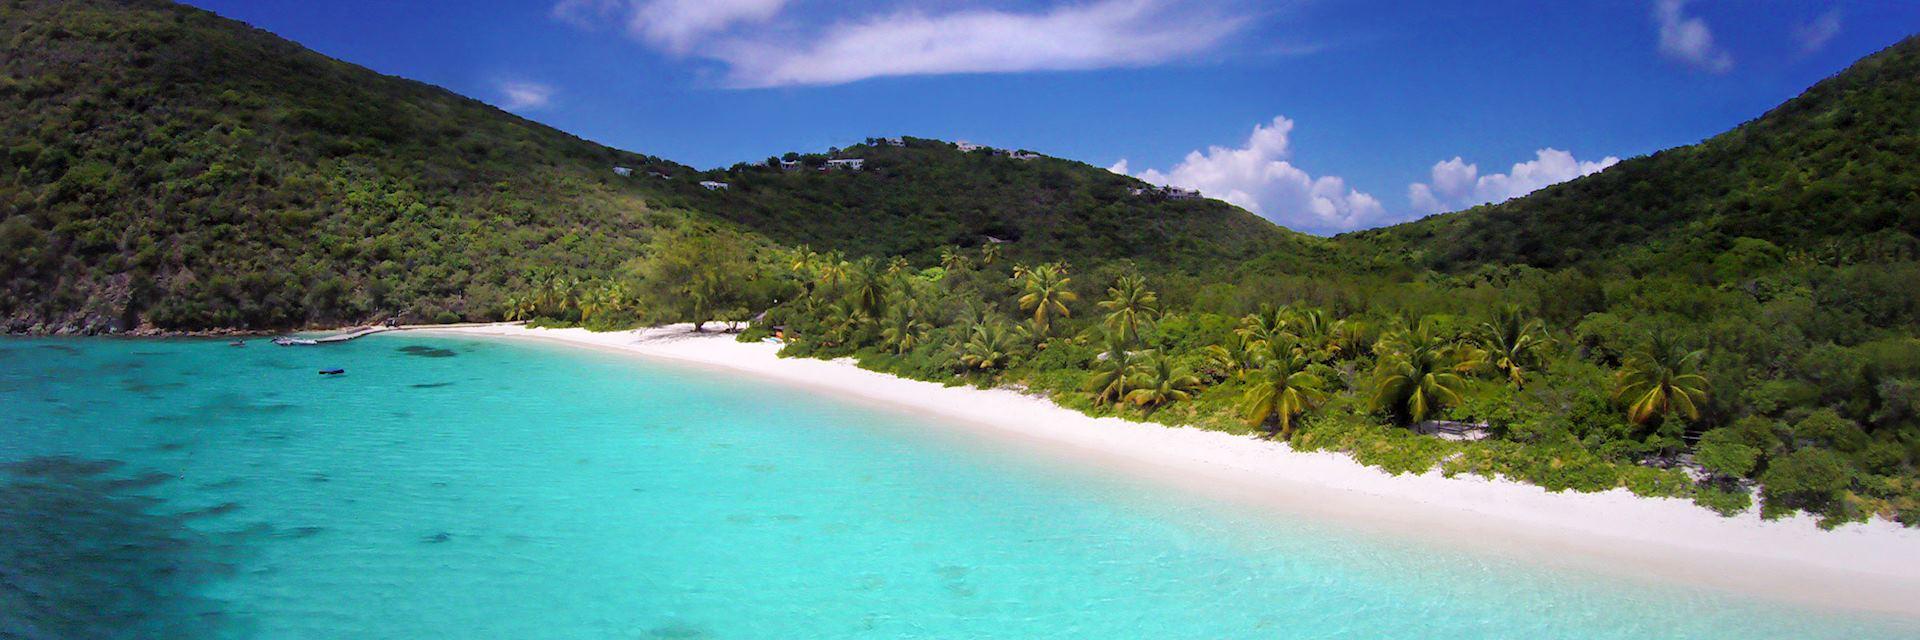 White sand beach on Guana Island